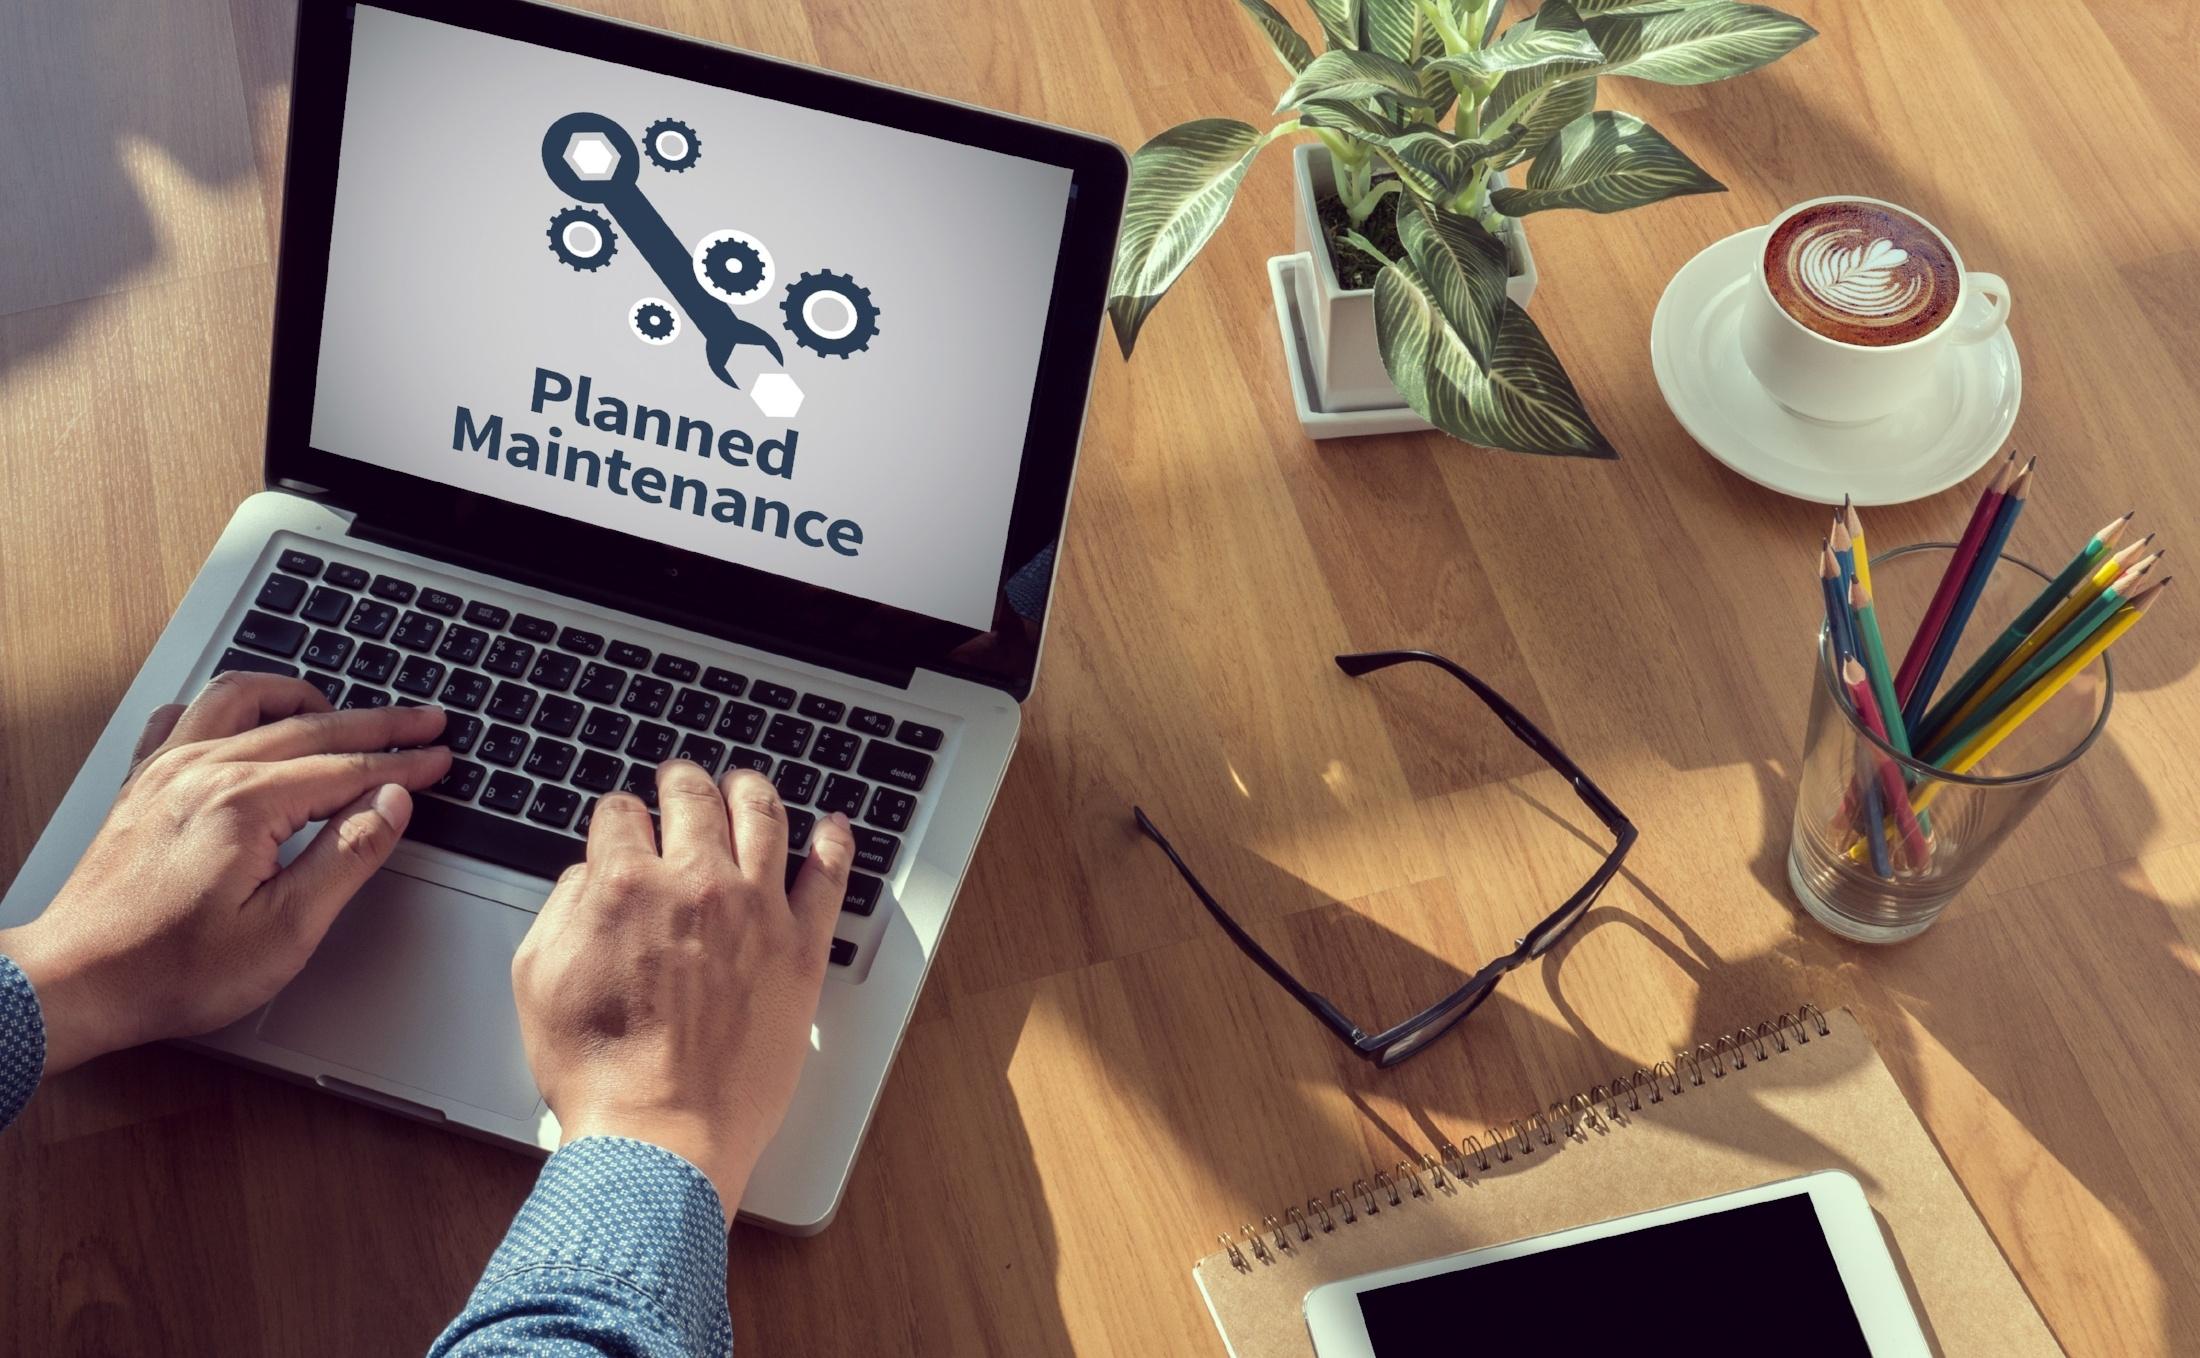 The Best Ways to Organize Work Order Maintenance Requests